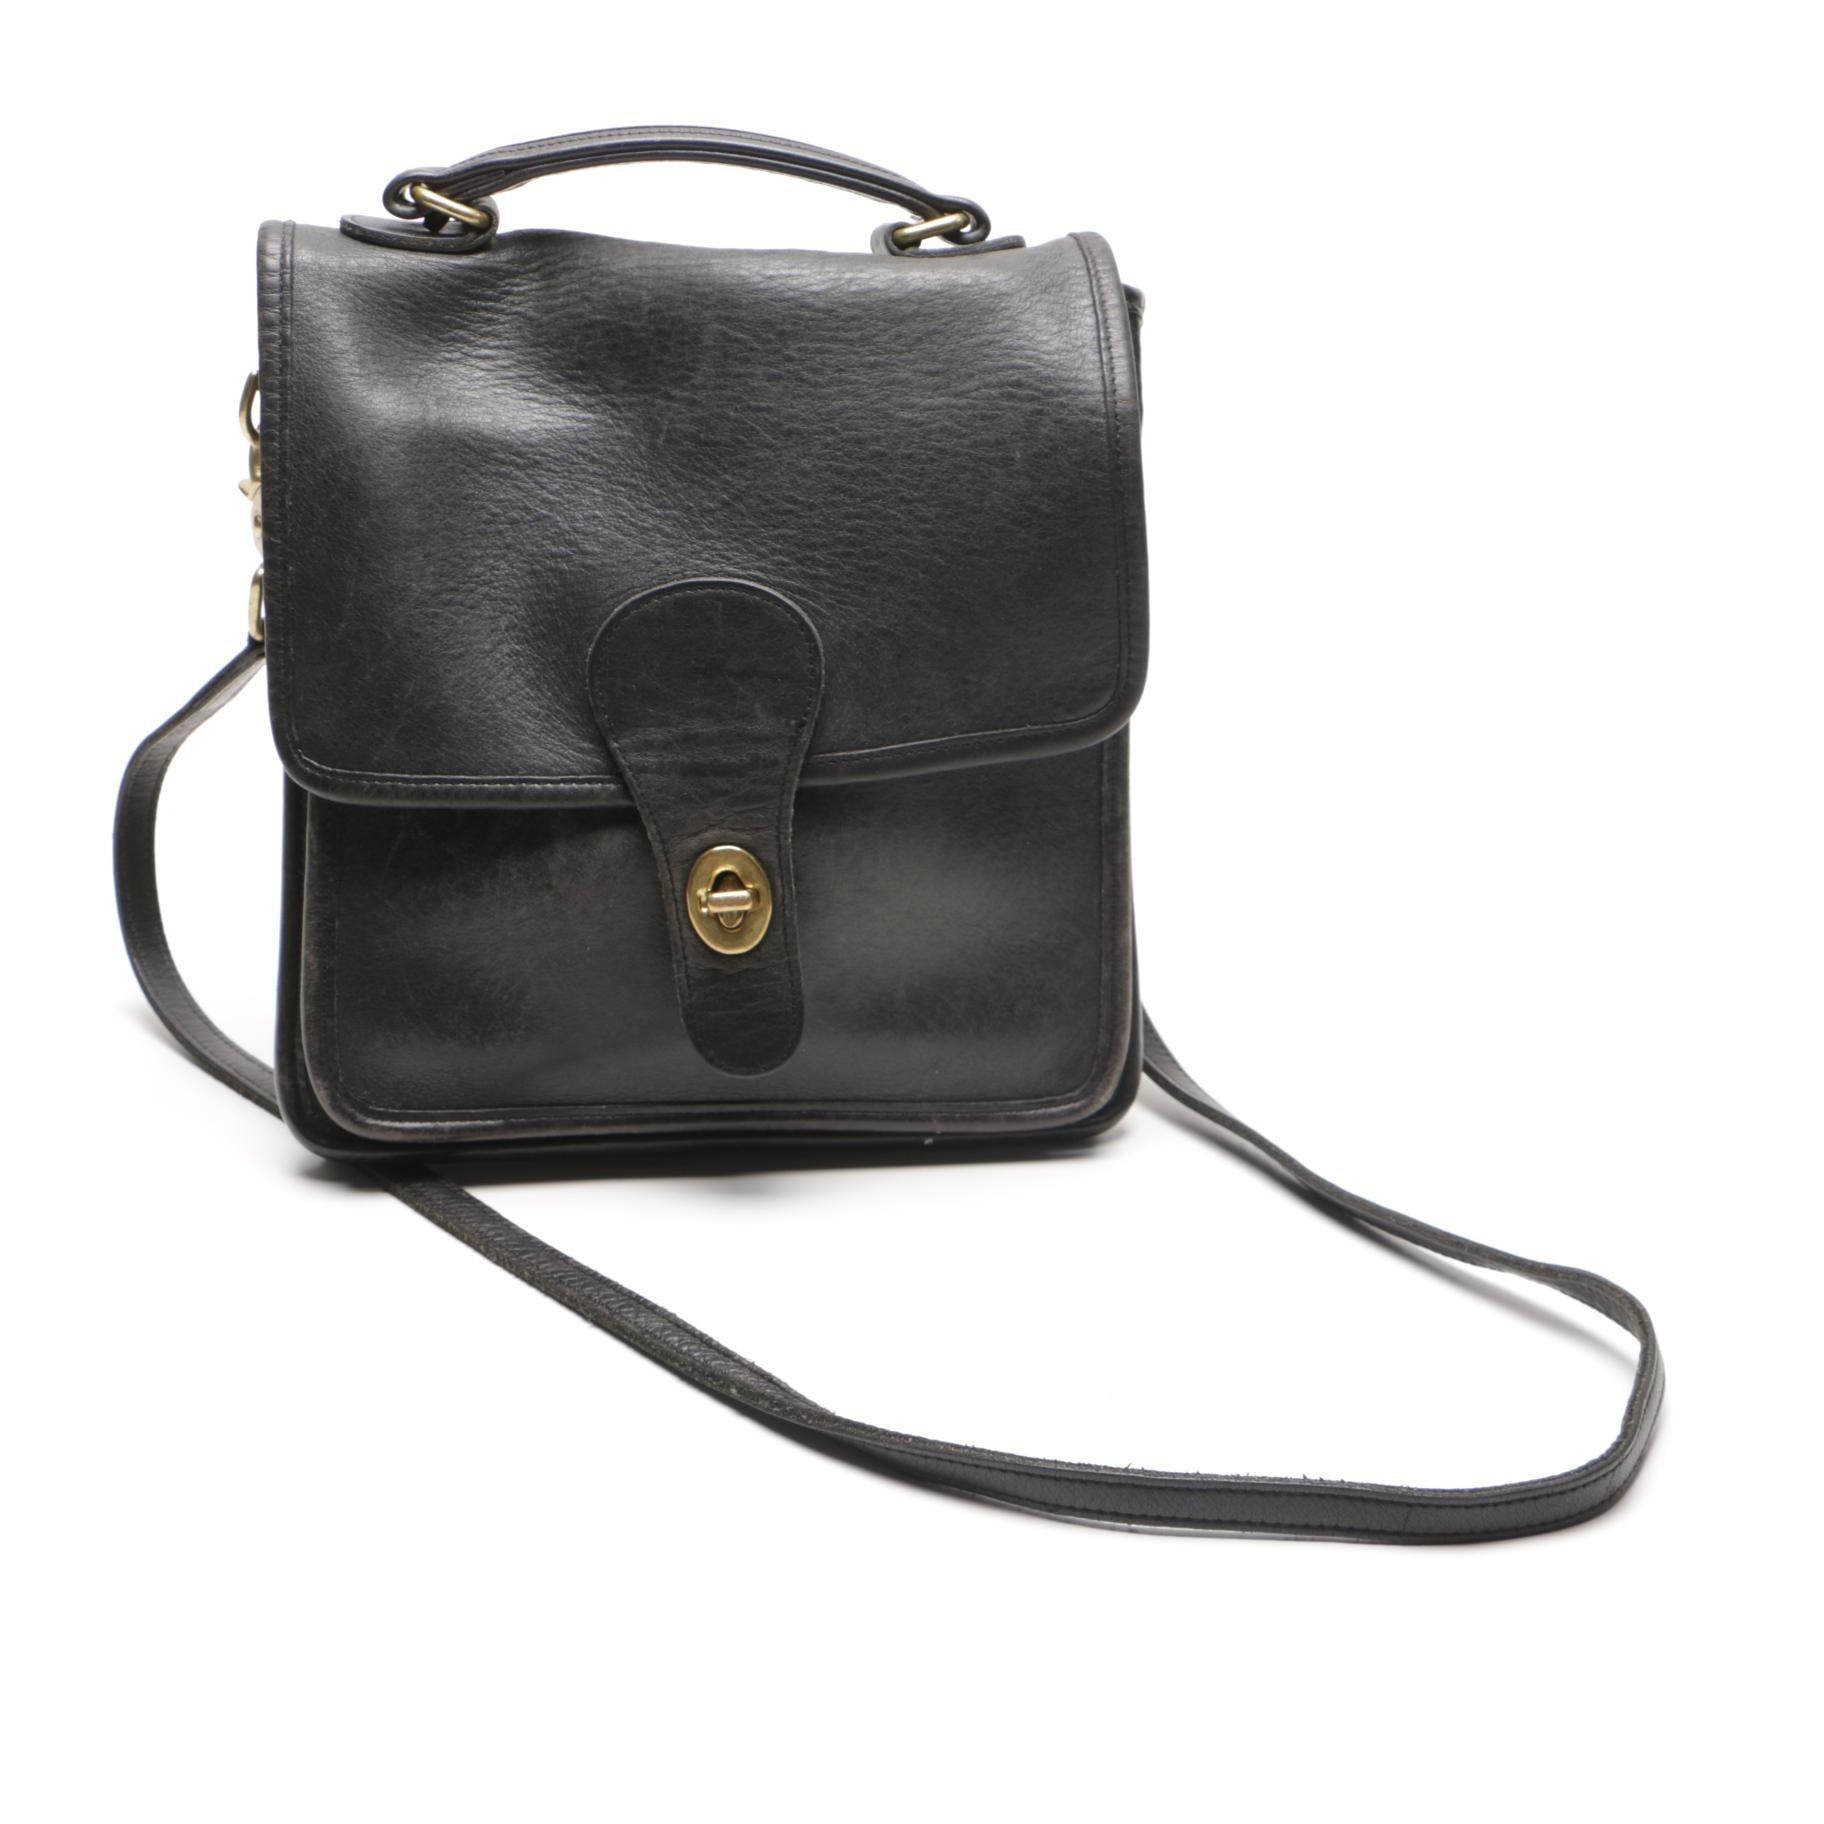 Black Coach Saddle Bag